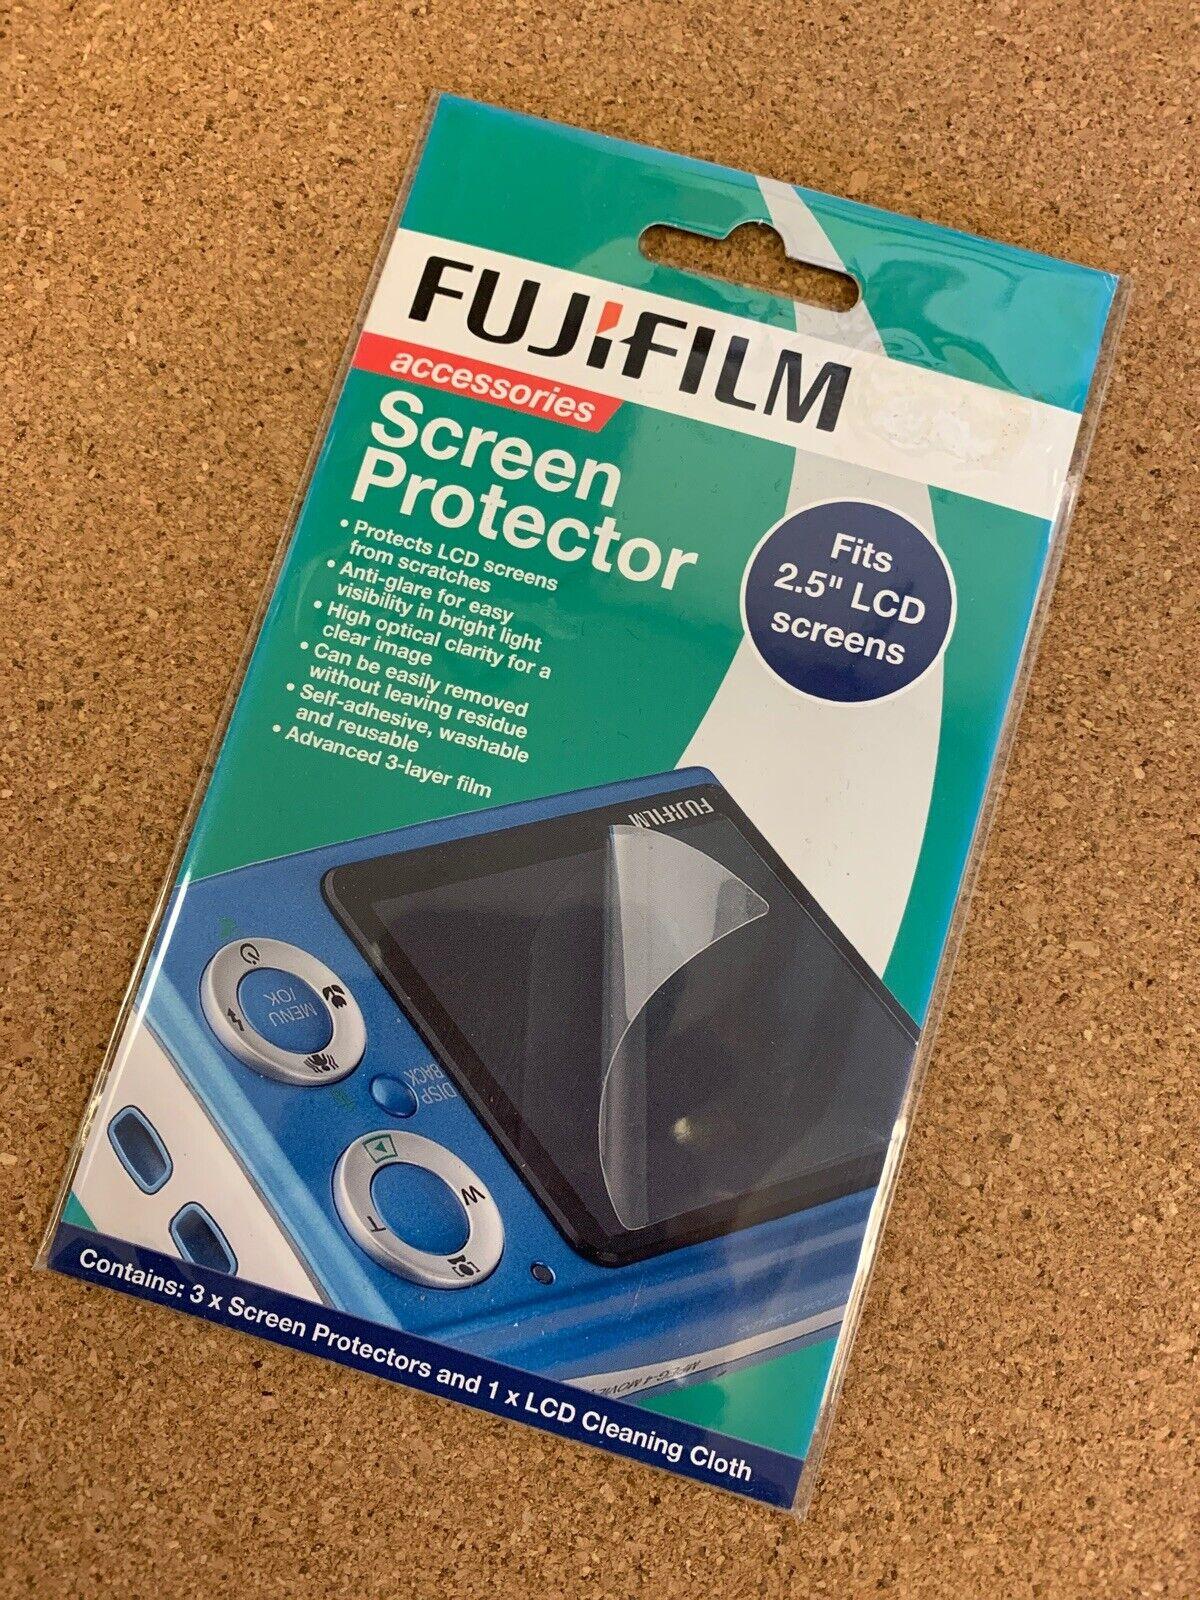 "Fujifilm Screen Protector for 2.5"" (diagonal) Inch LCD Screen"